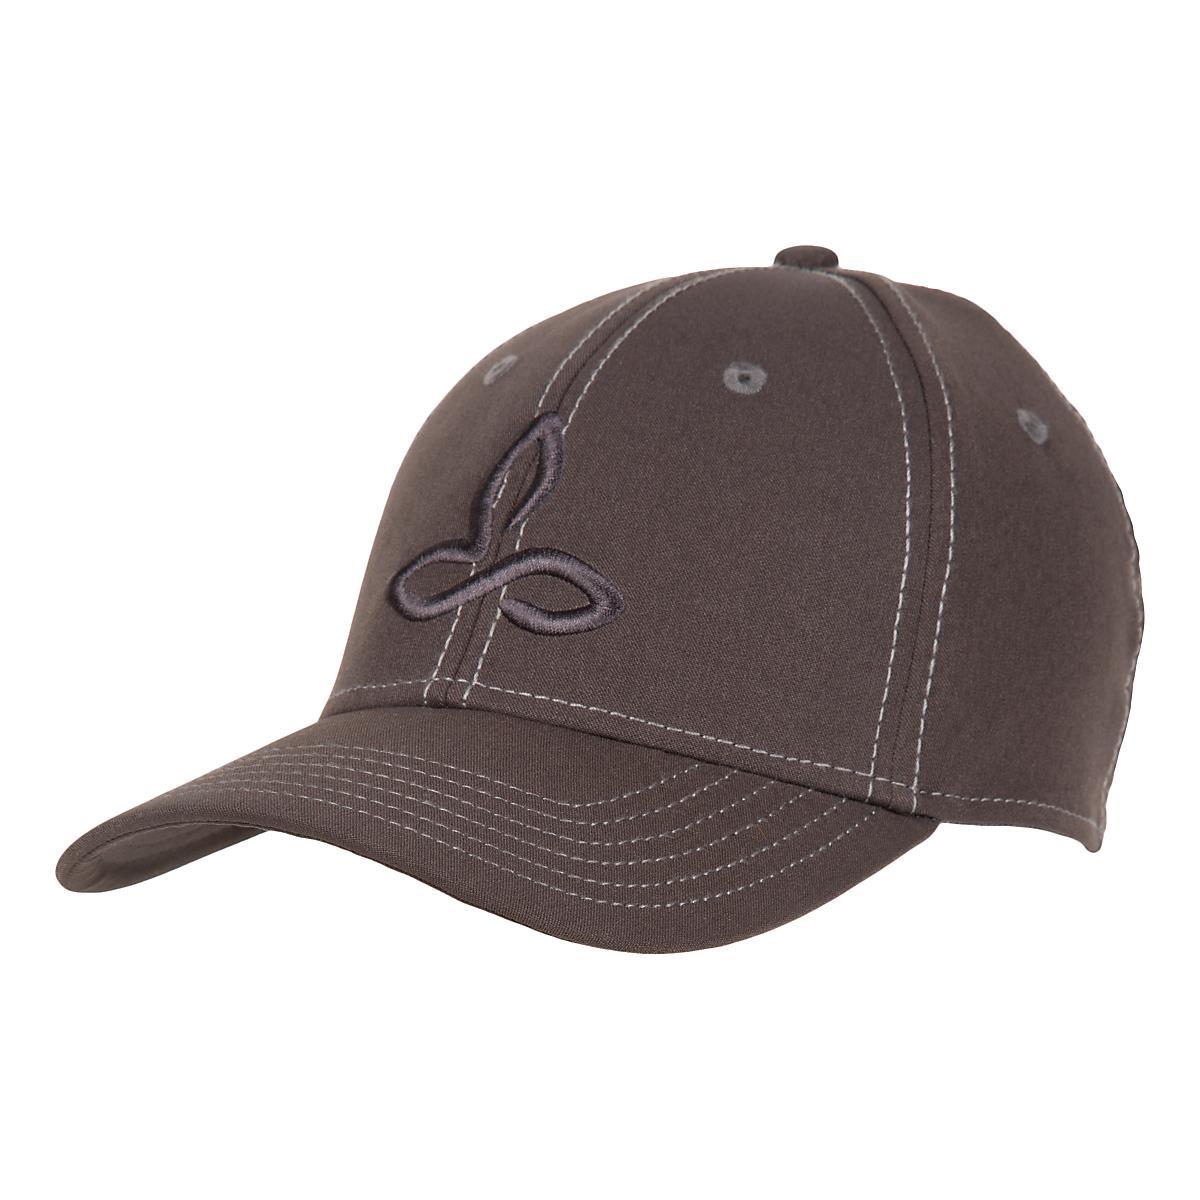 Men's Prana�Zion Ball Cap